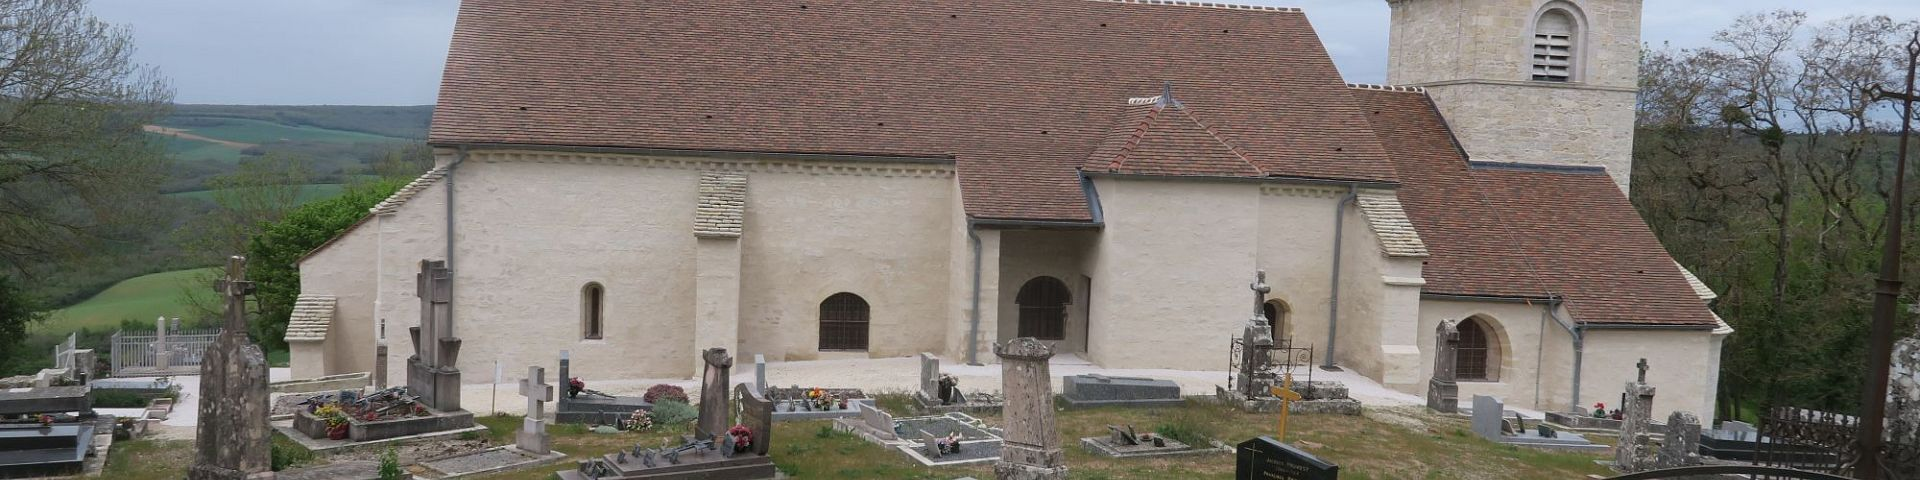 Reulle-Vergy - Eglise Saint-Saturnin (21)